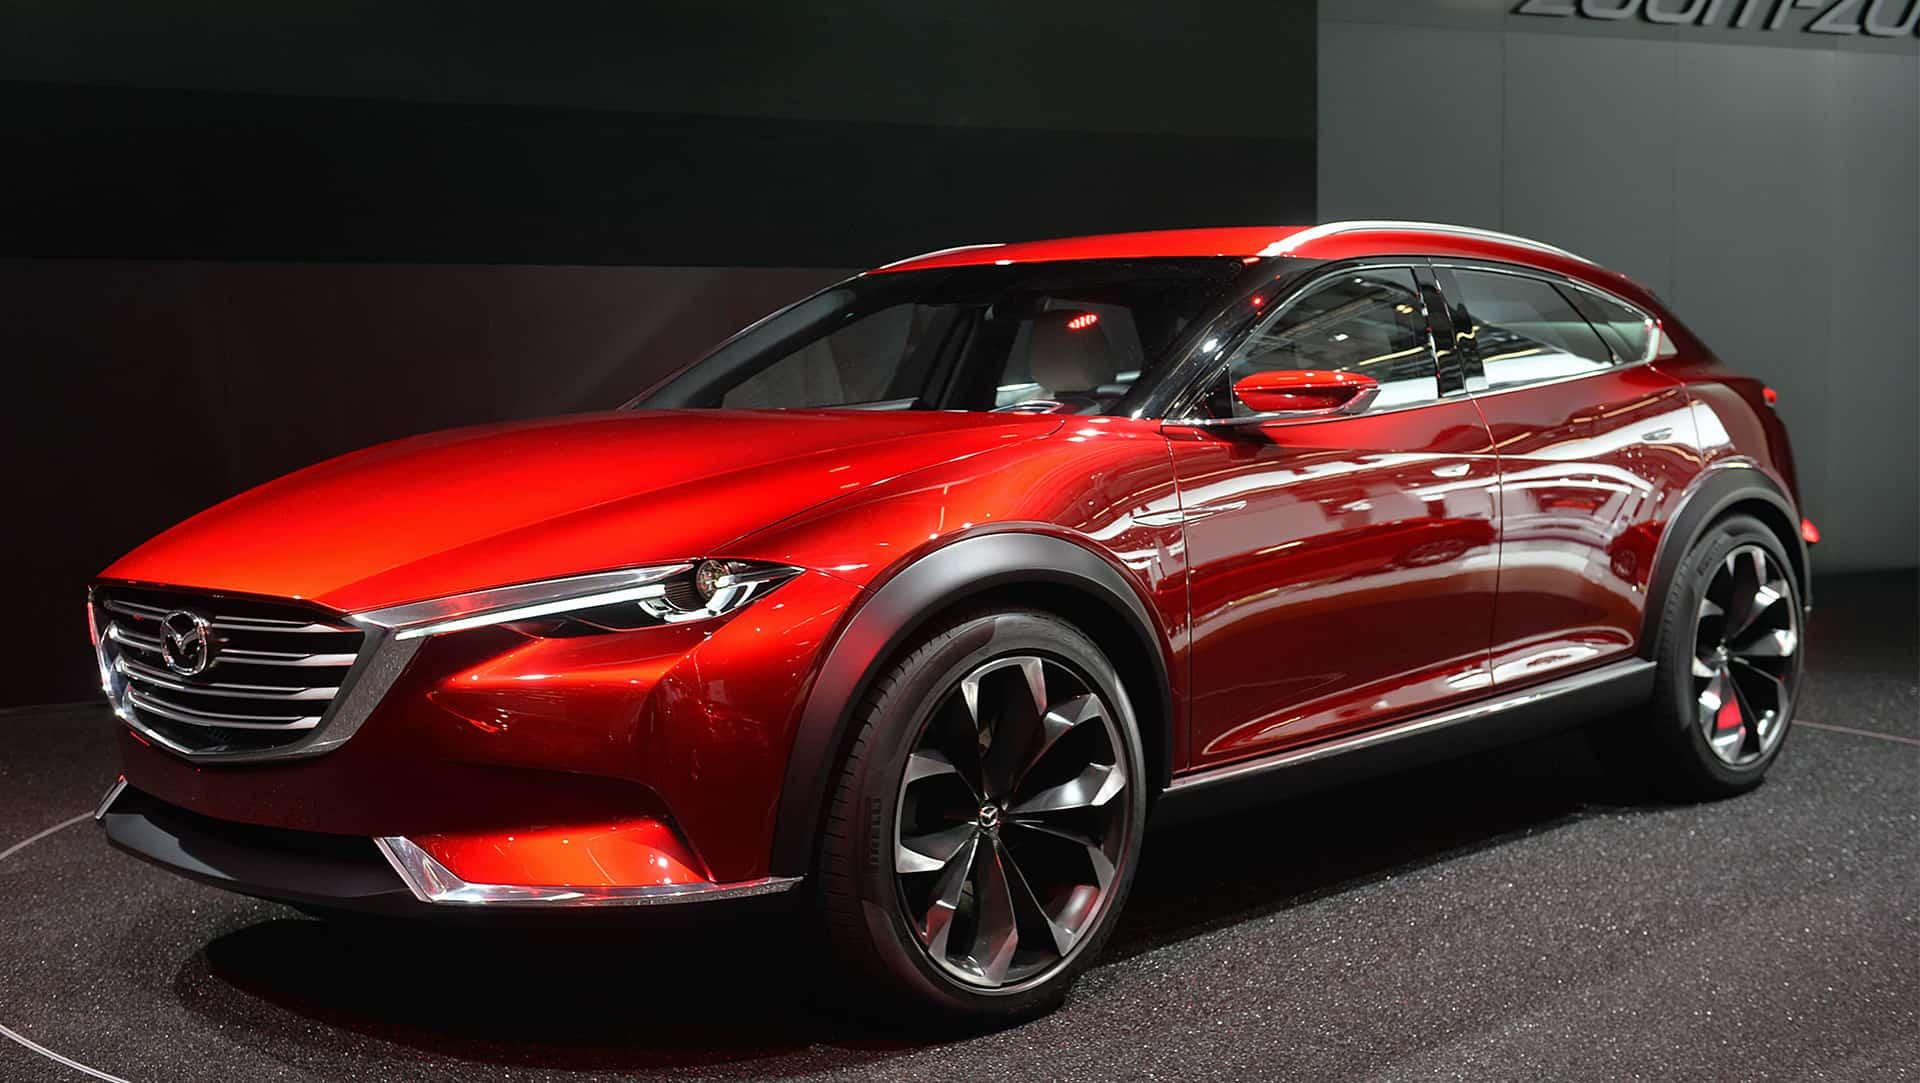 Mazda's Game Changer